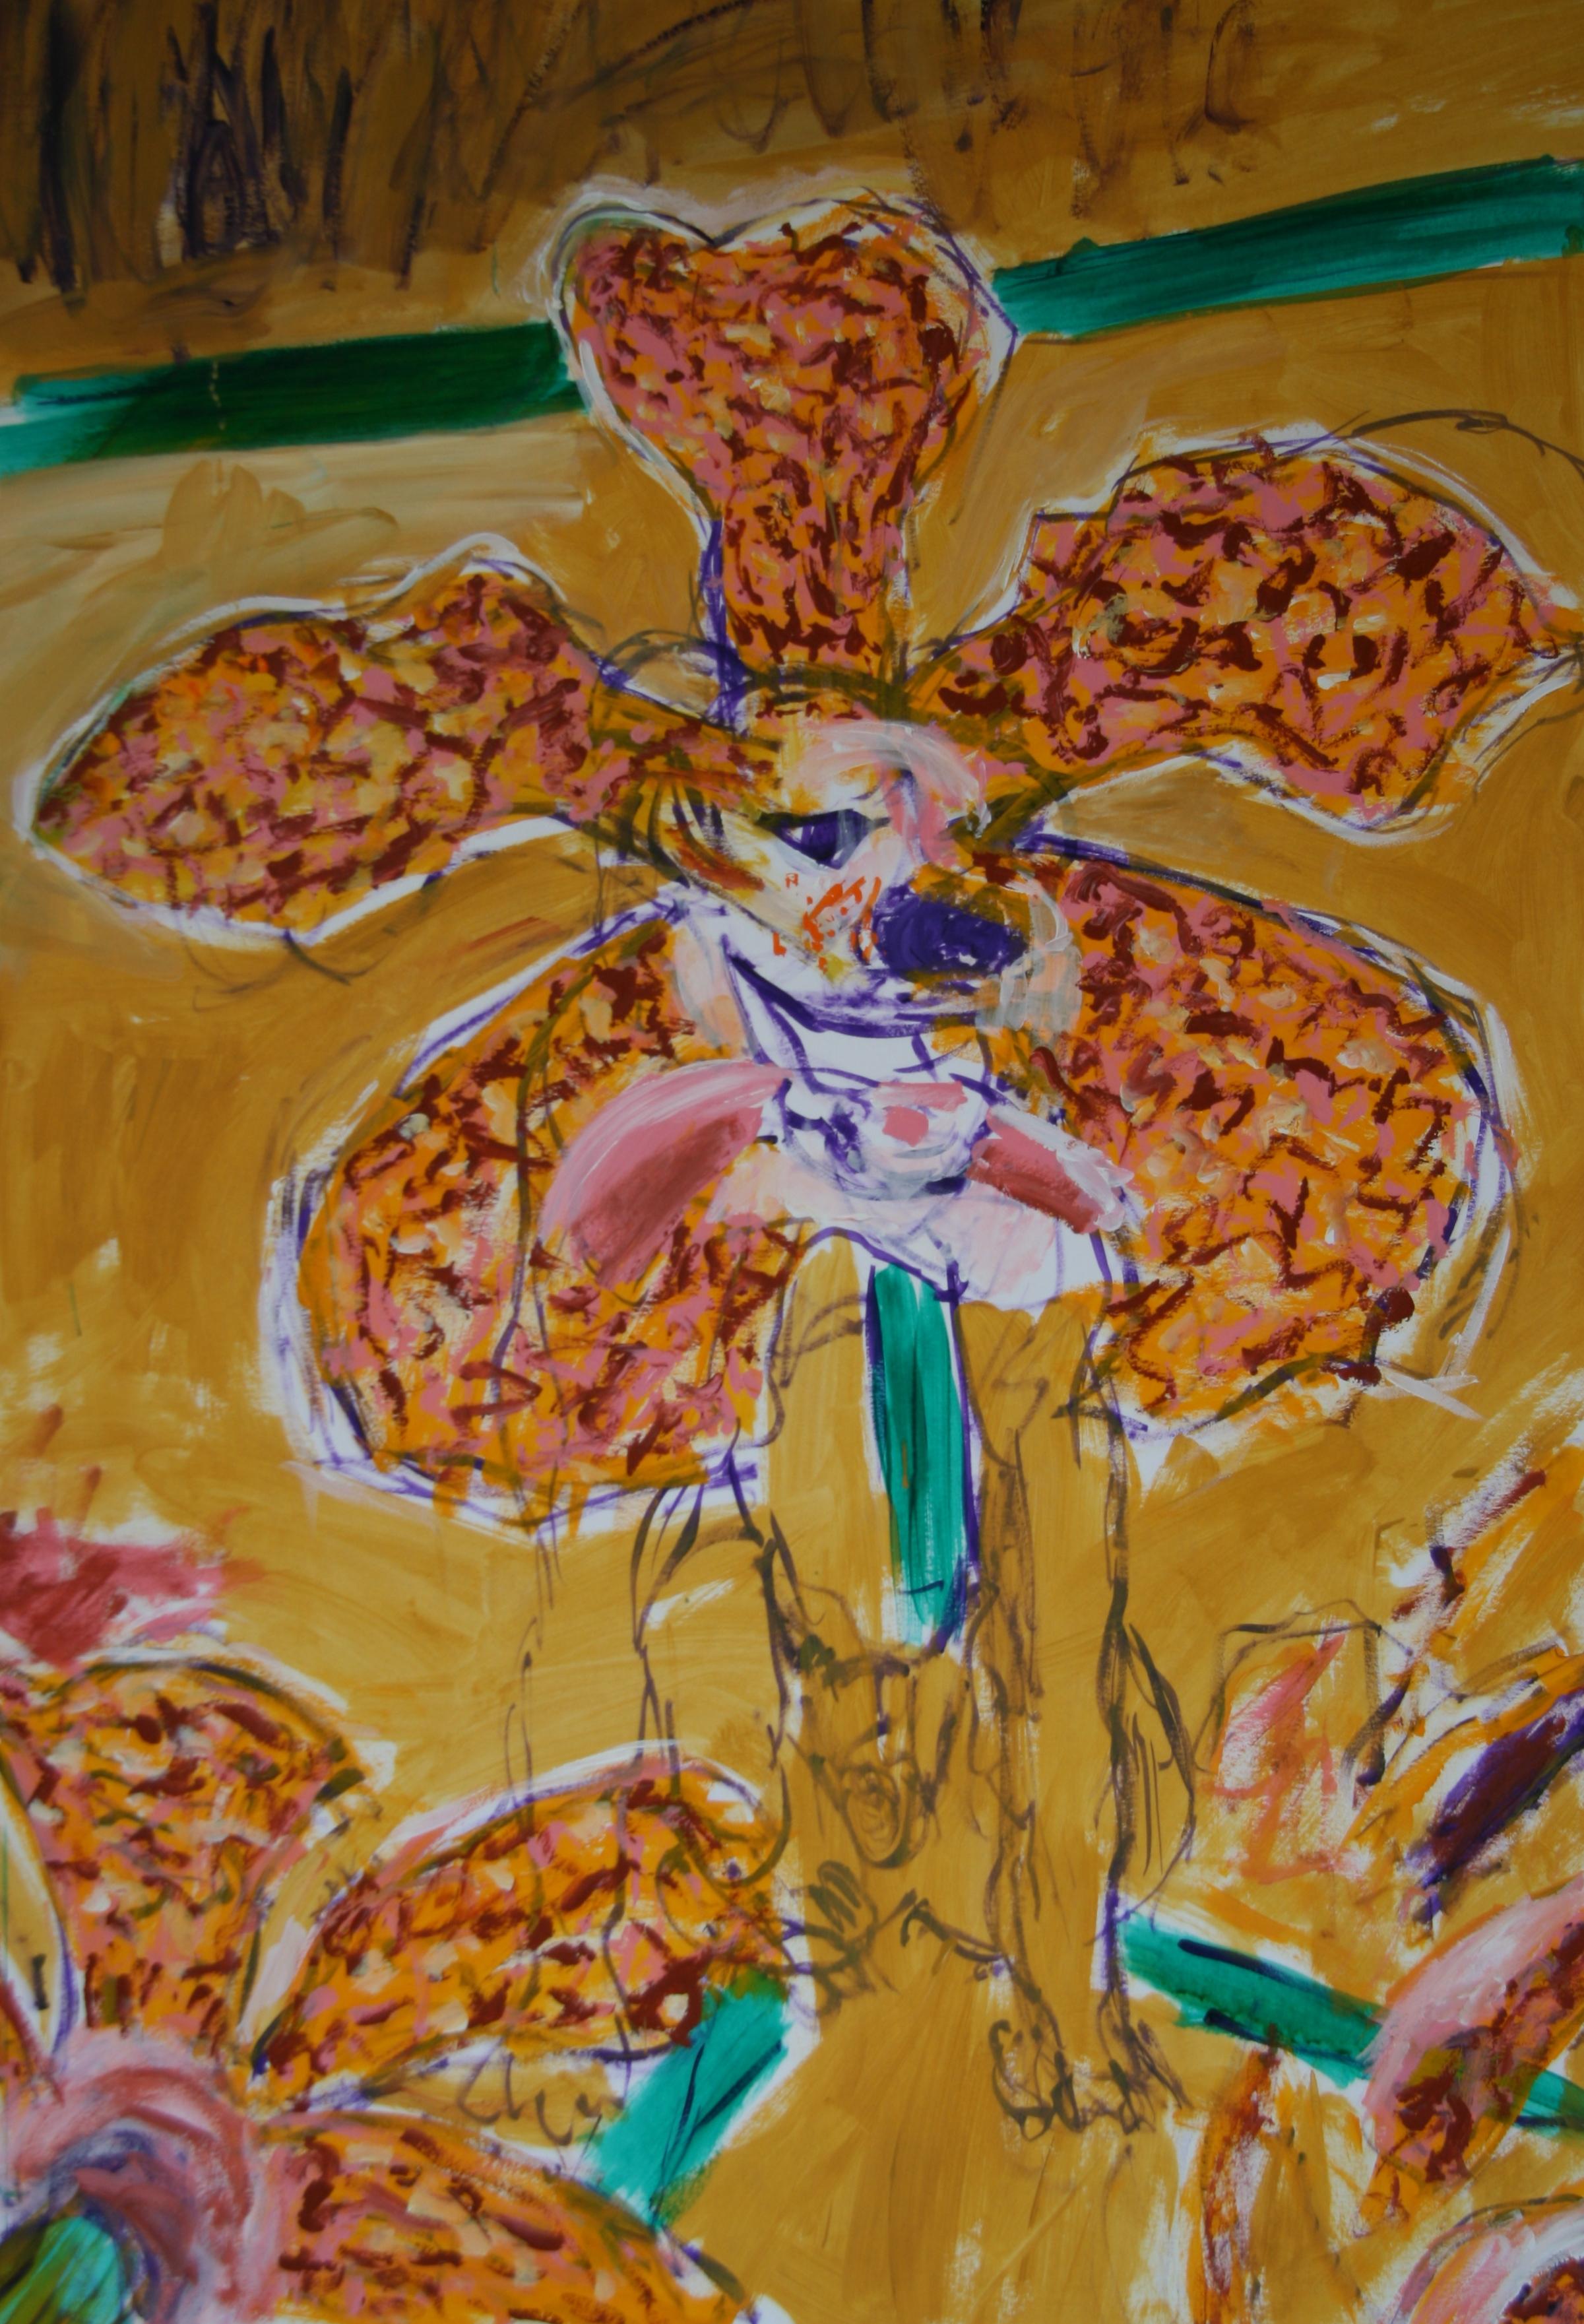 Die Begeisterte Blume 5, 100x70cm, acrylic on paper